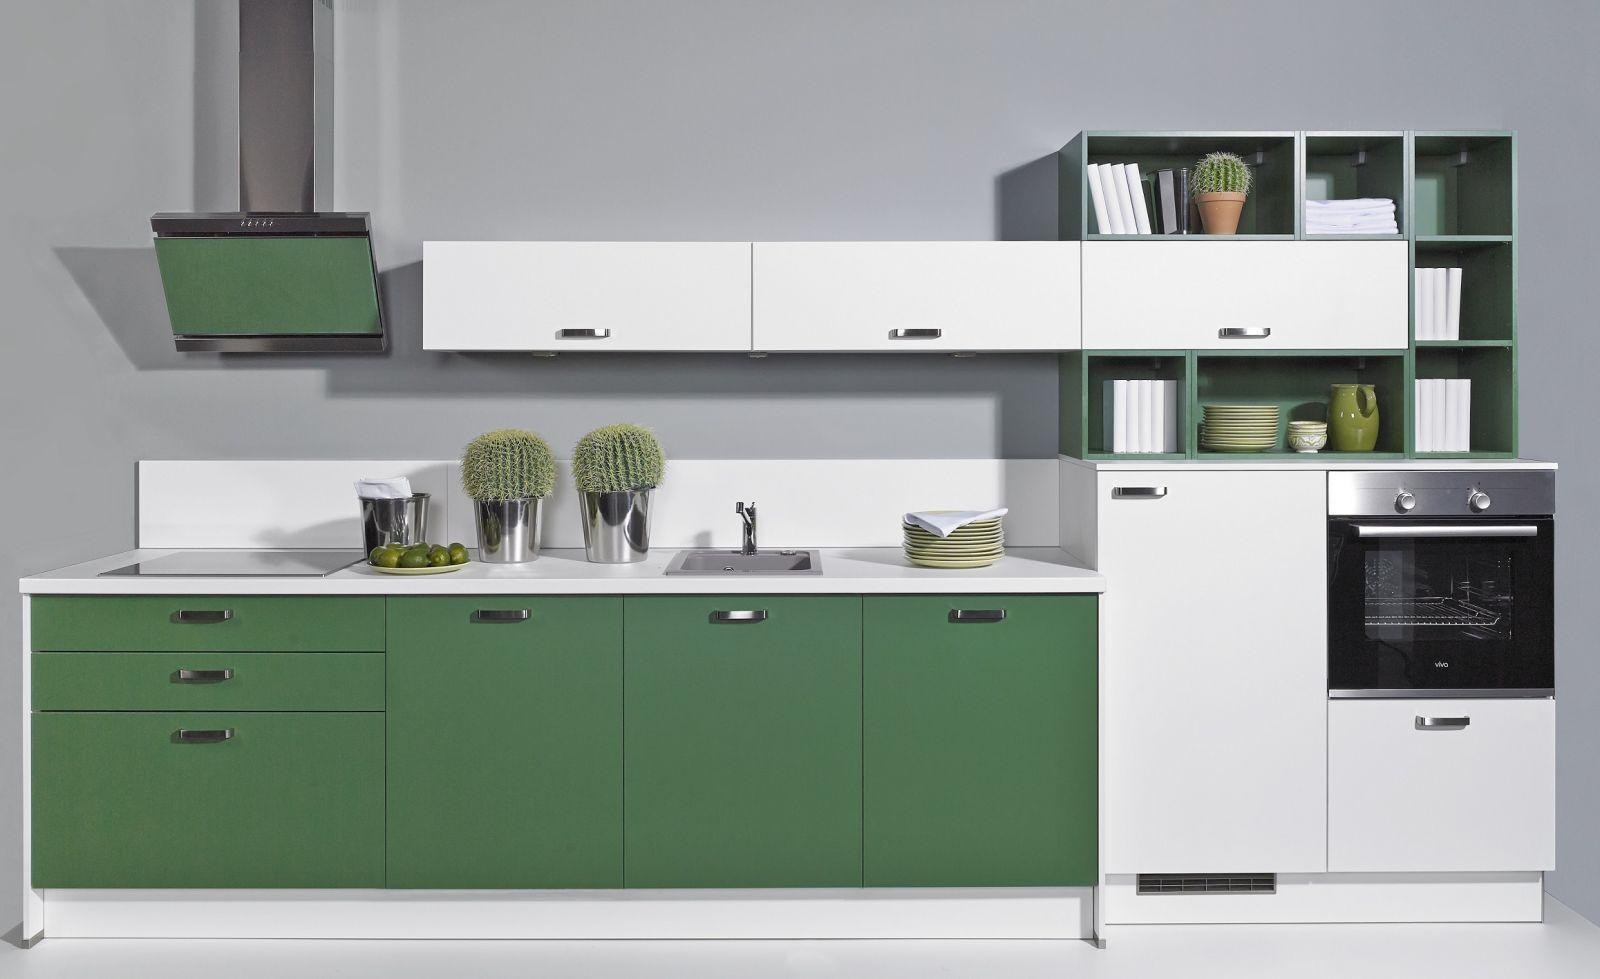 win express k chen. Black Bedroom Furniture Sets. Home Design Ideas